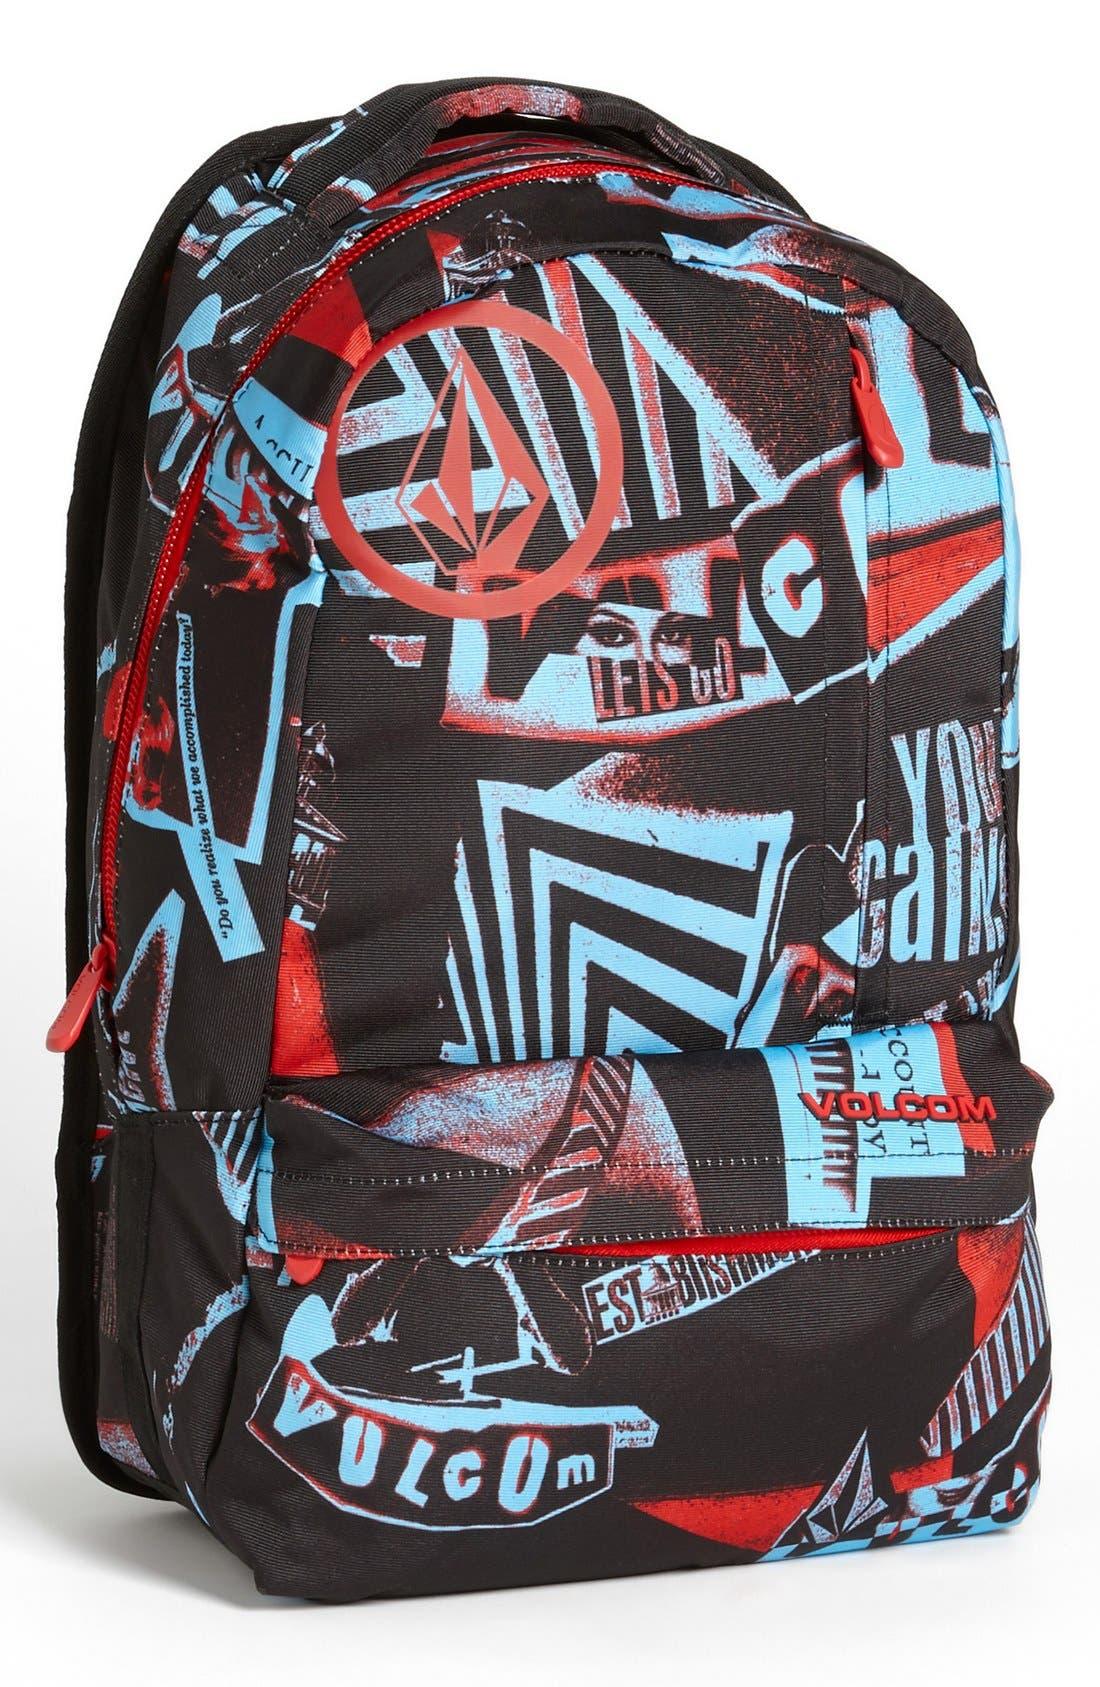 Alternate Image 1 Selected - Volcom 'Basis' Backpack (Boys)